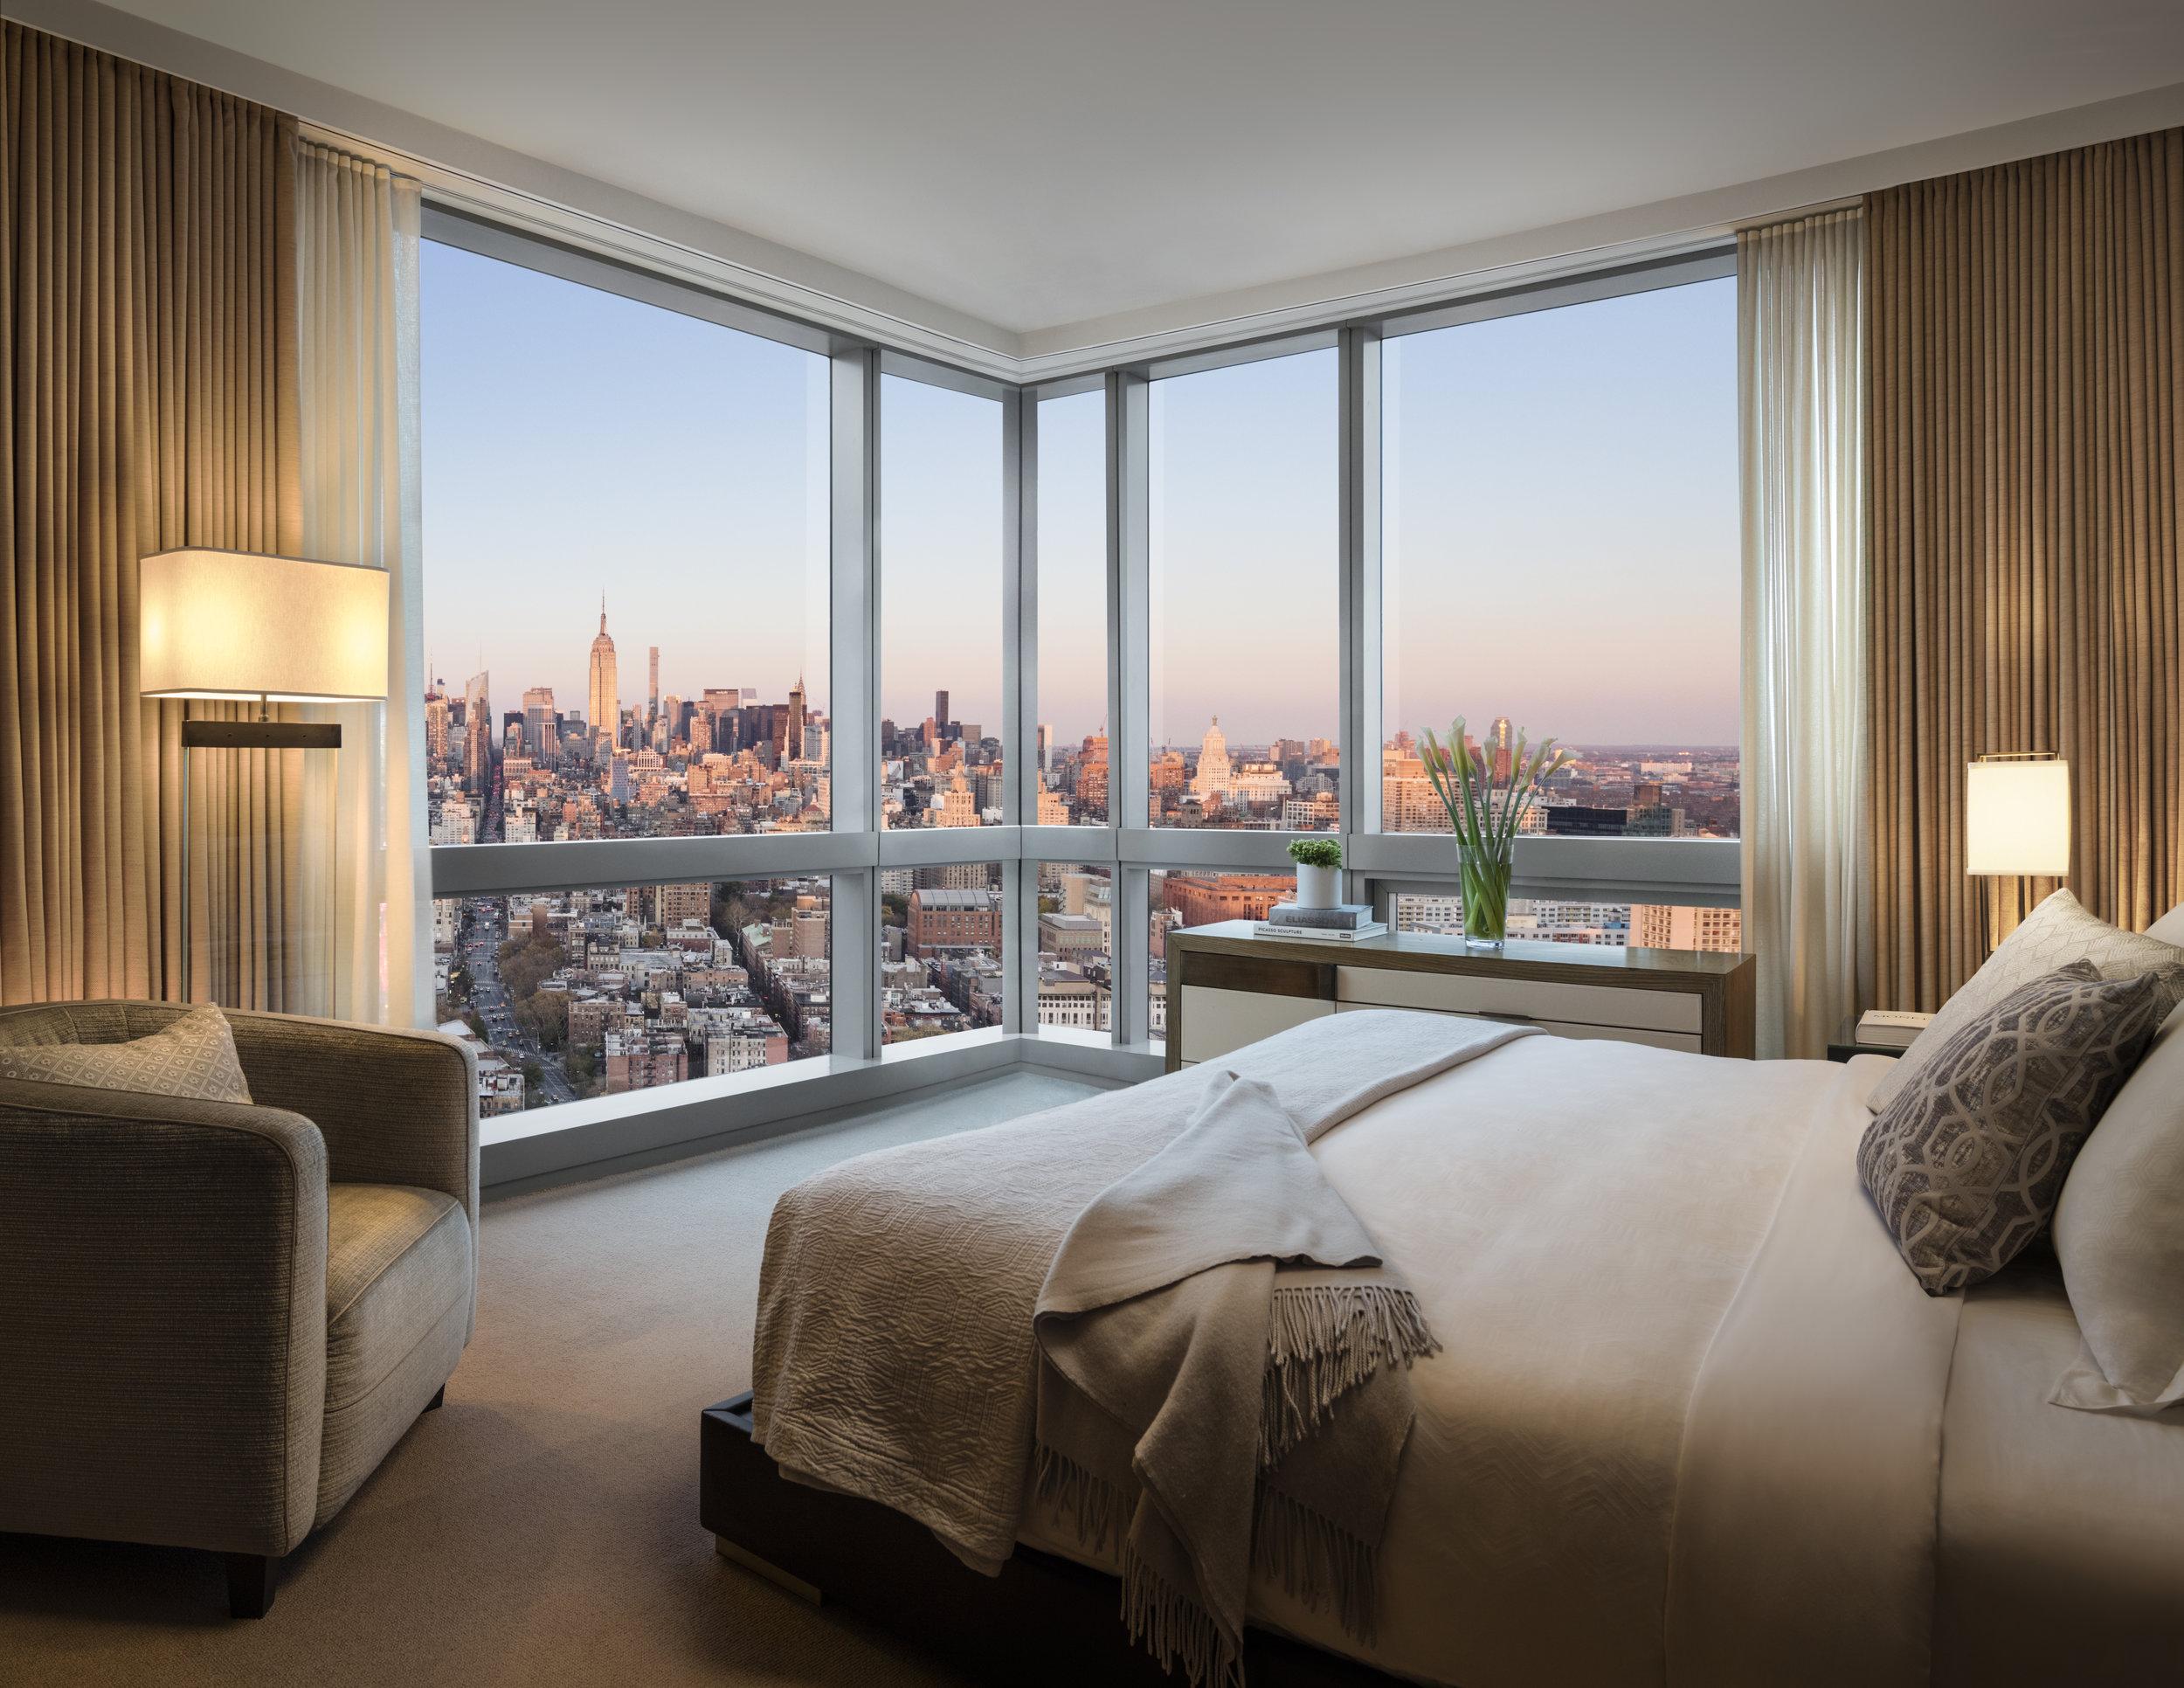 Soho_Night Bedroom_SFrances_151112_8712_367m_xl_R1A.jpg